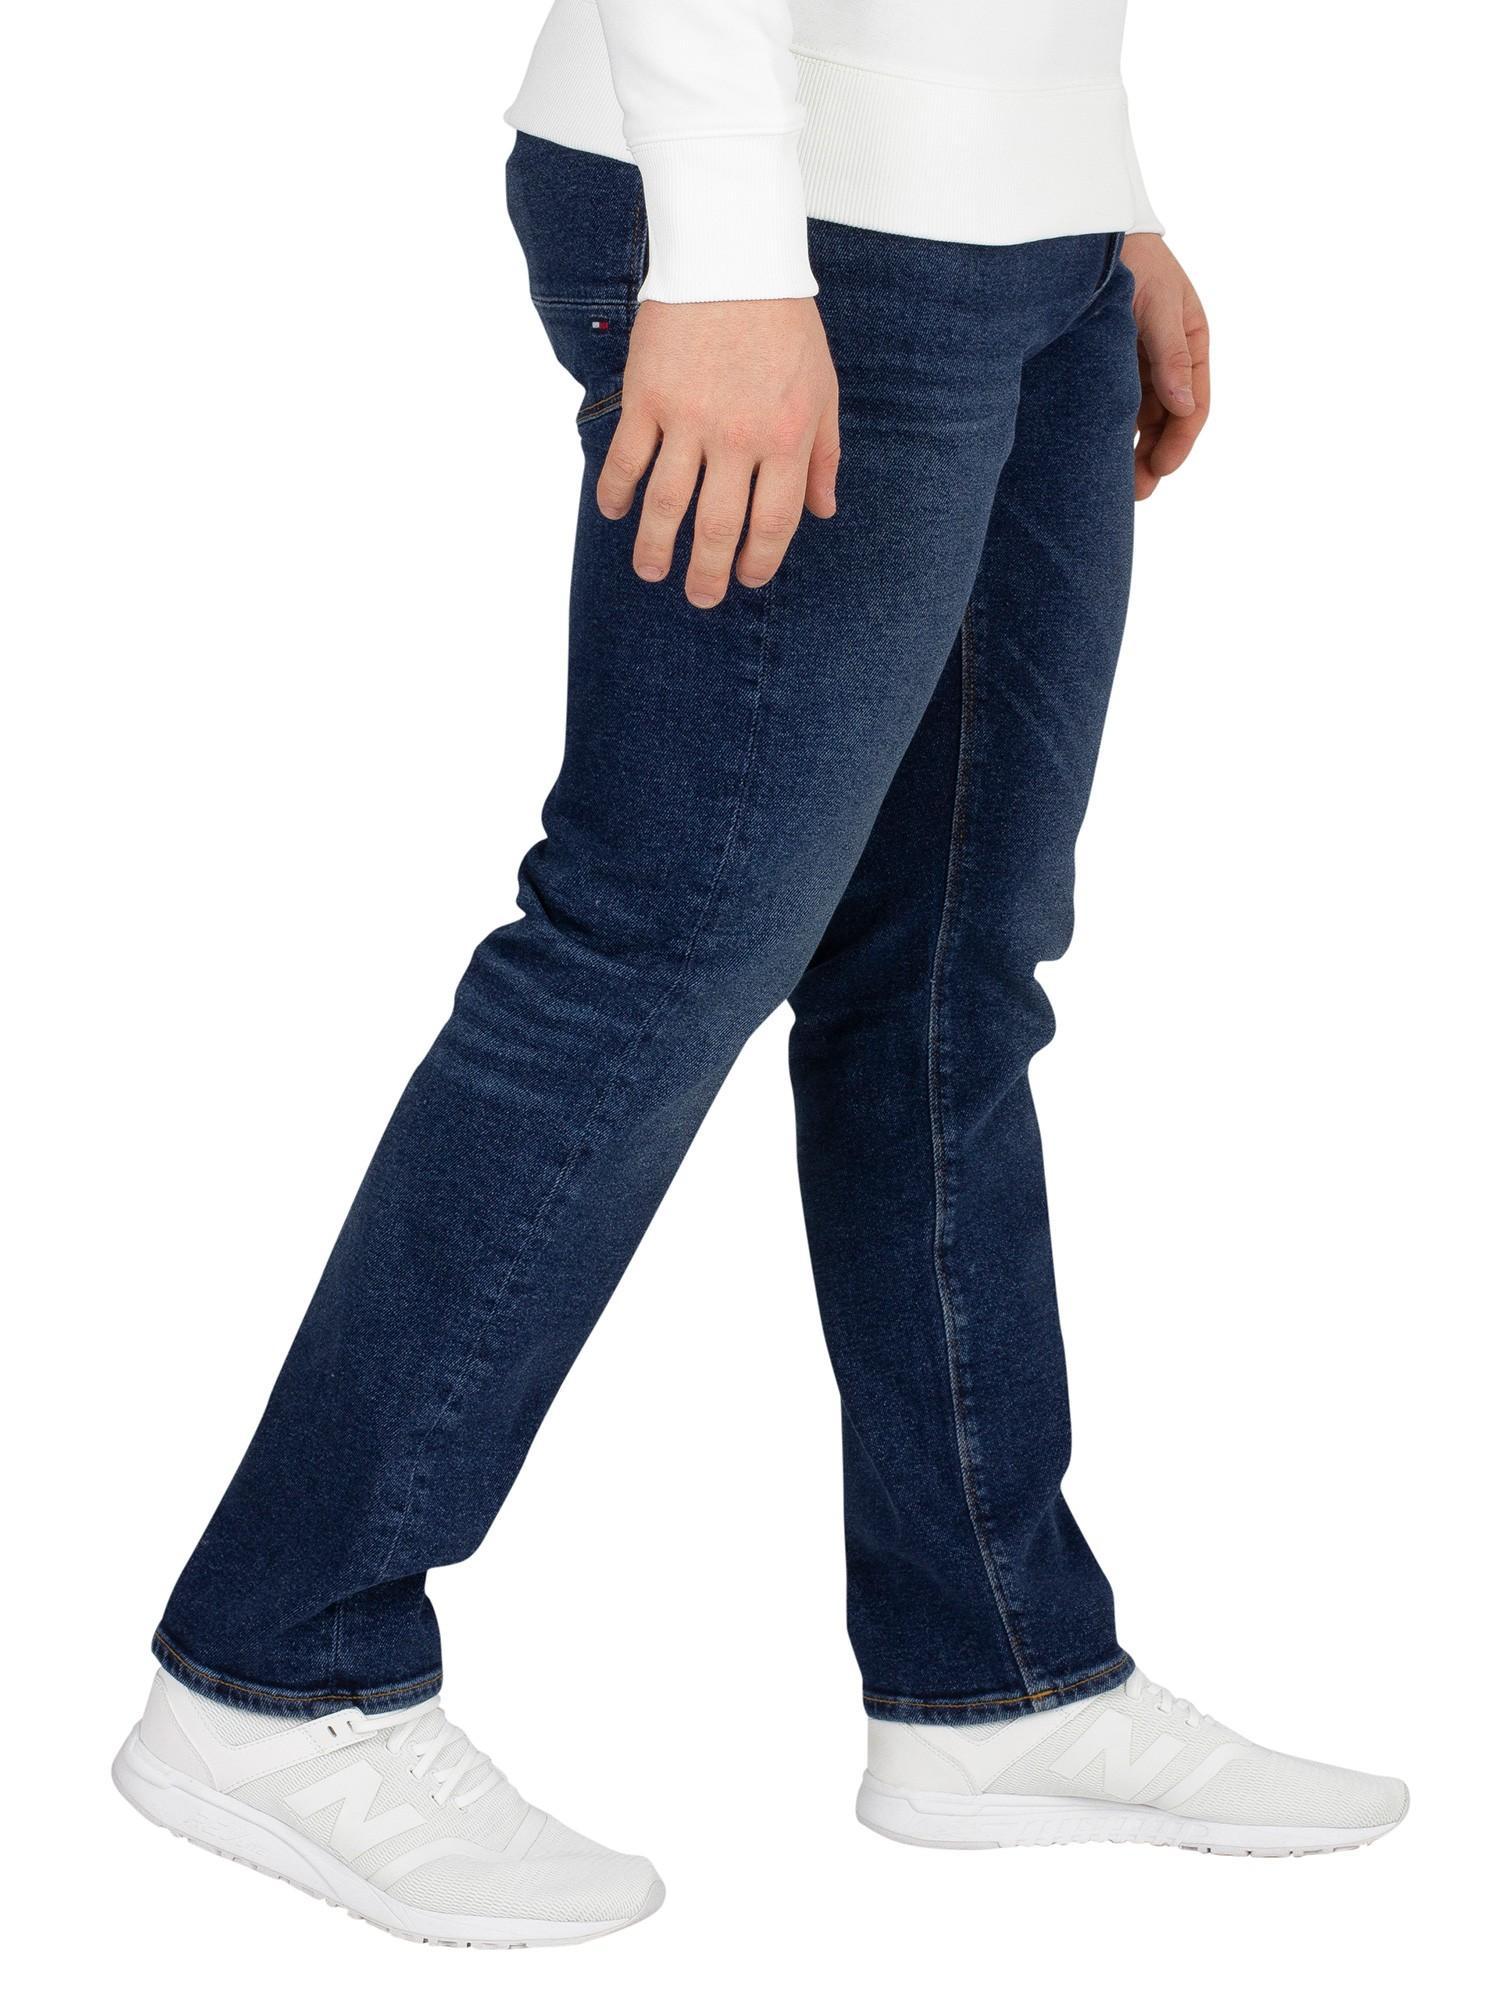 Ammon Blue Tommy Hilfiger Denton Straight Fit Jeans